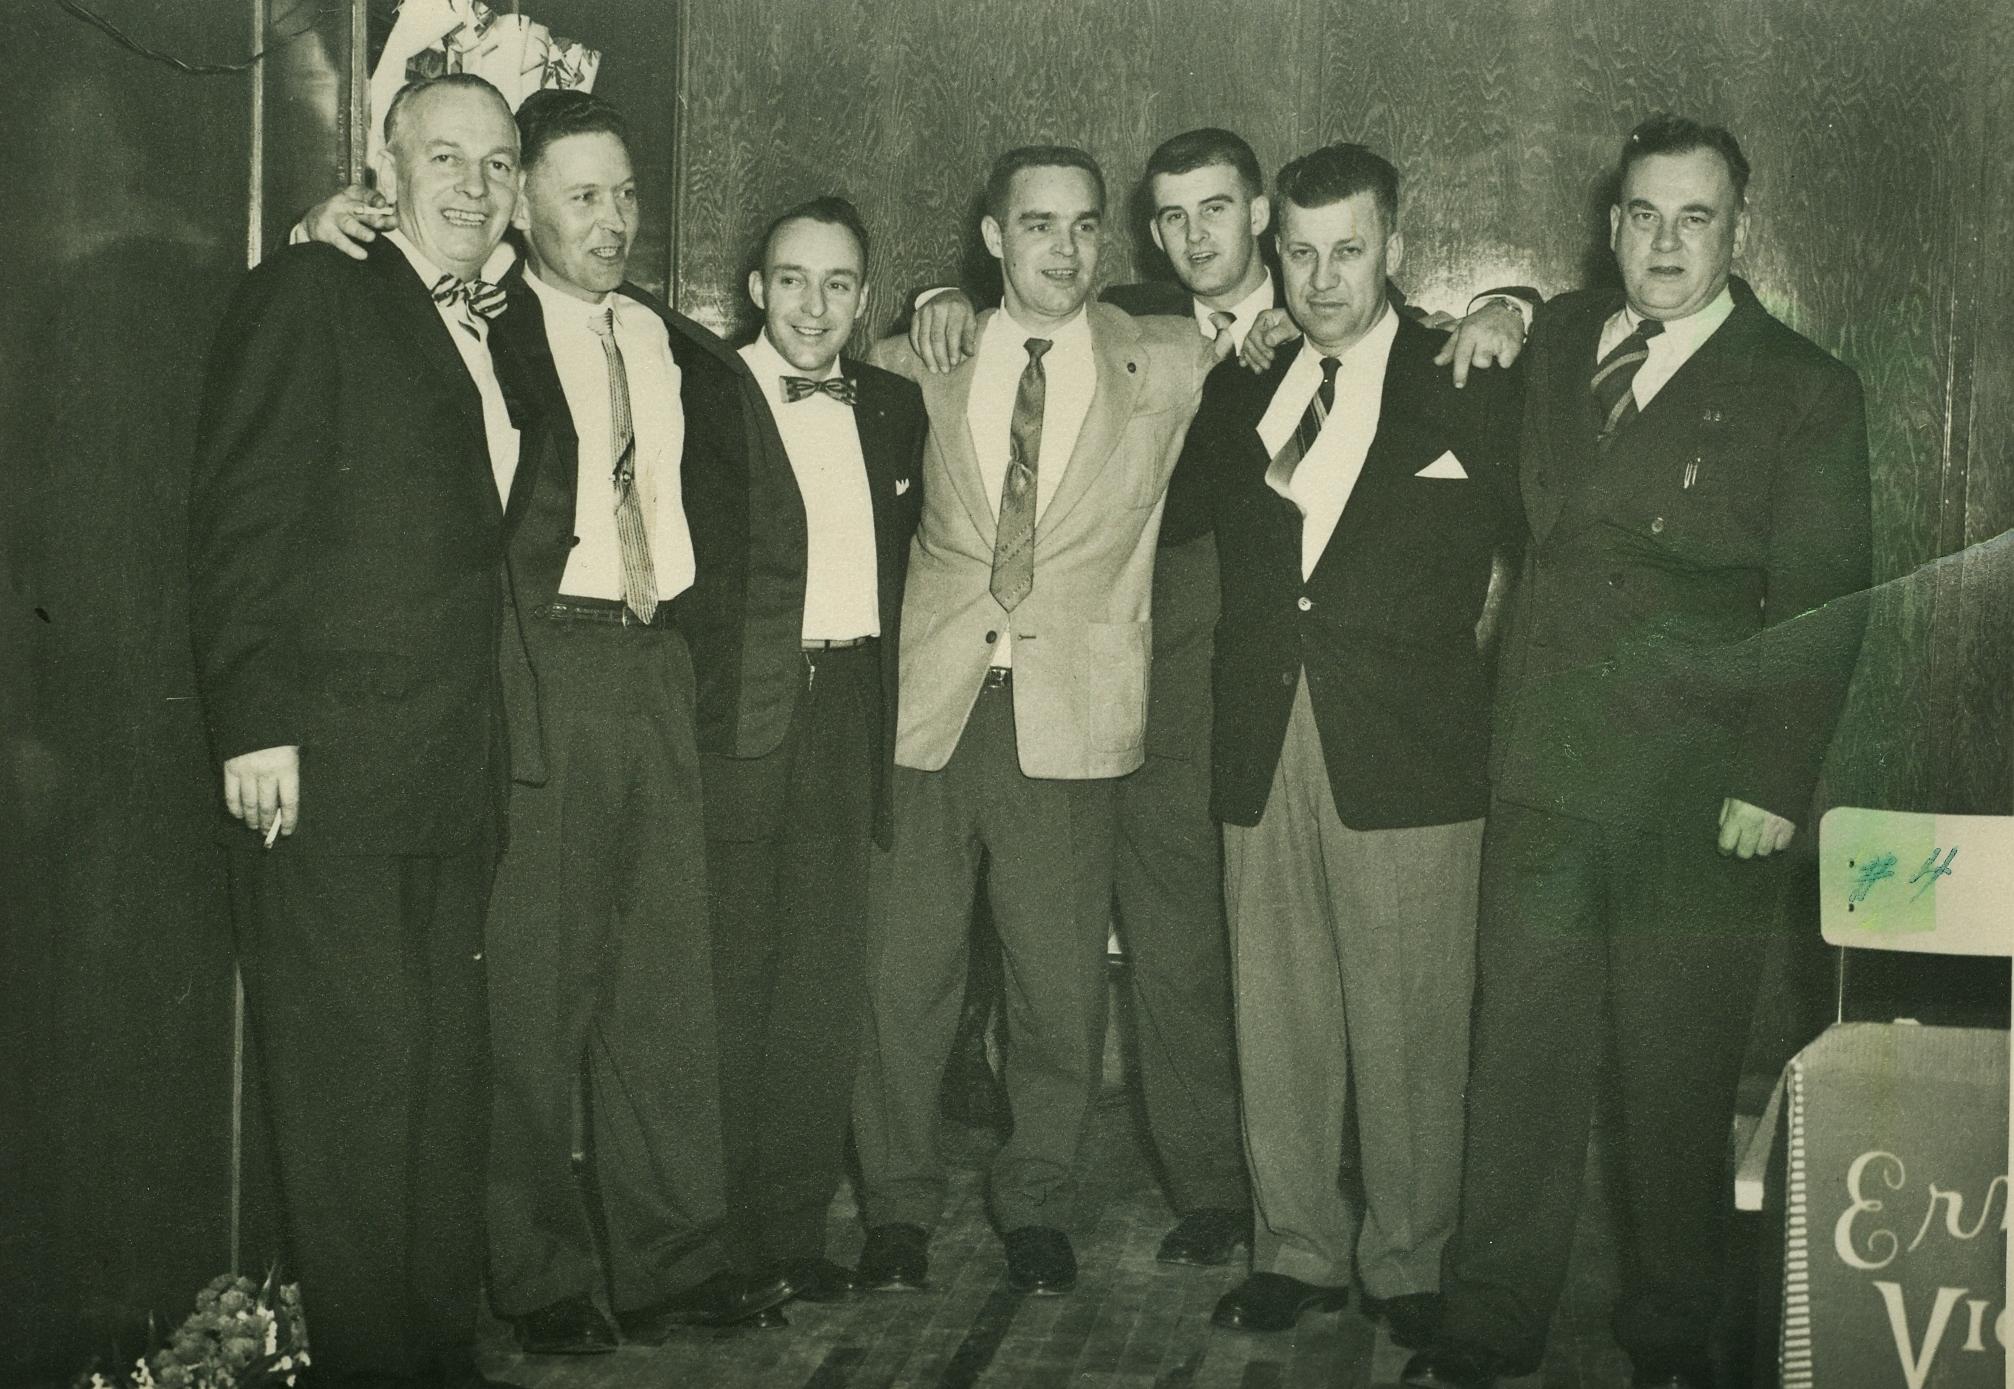 . Bill MacDonald, Maurice Fenton Cecil Bell, George 'Buck' Mantle; ; Glen Derry; George Osborne, Bill Monk;